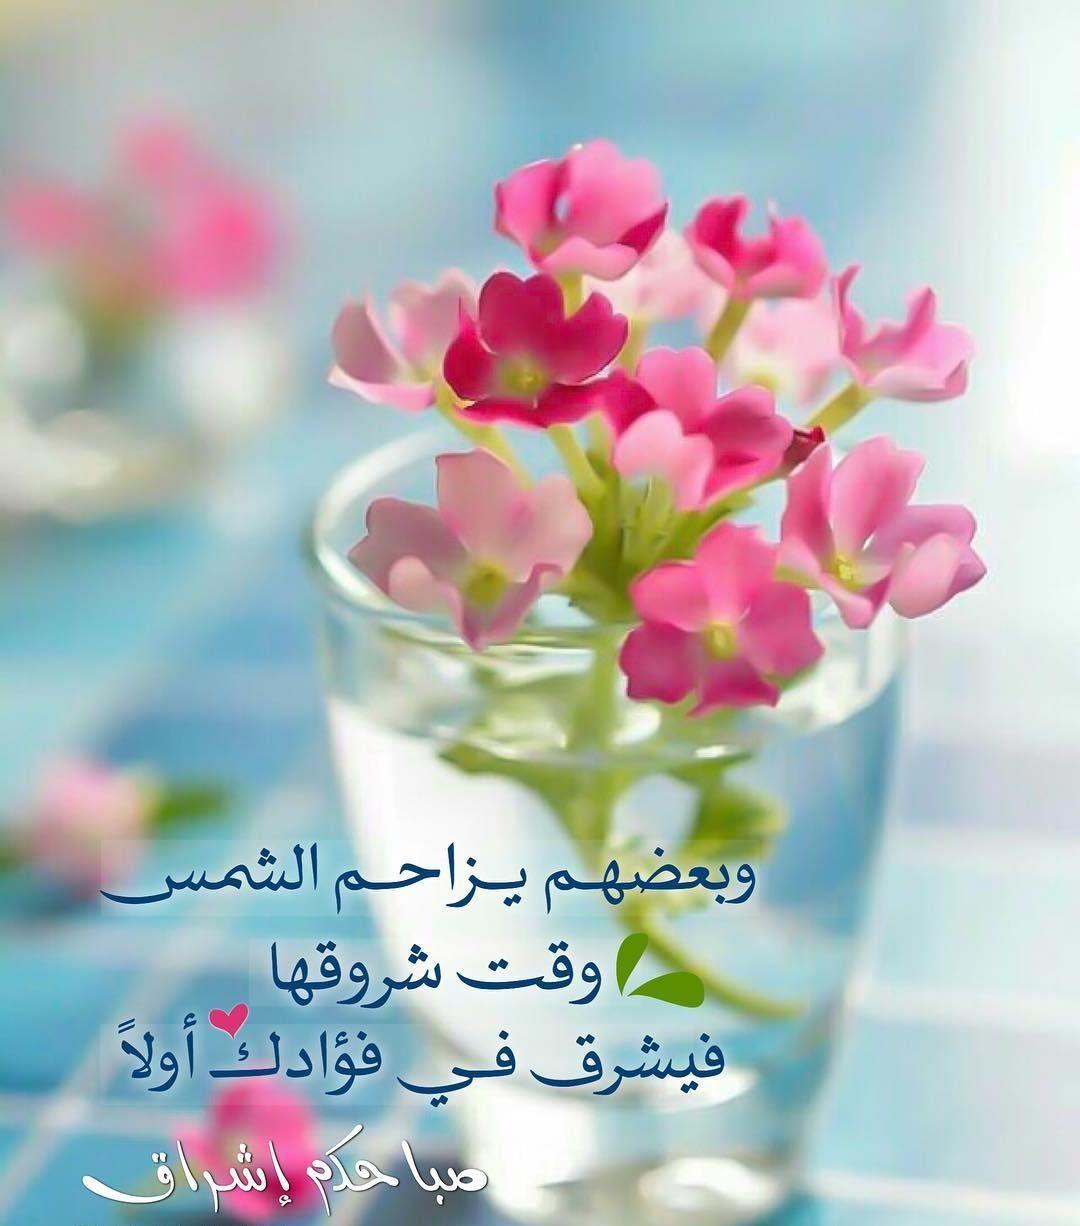 Pin By رغــــــد On بطـاقـات صبـاحيـة واسـلاميـة 2 Messages Ramadan Glassware